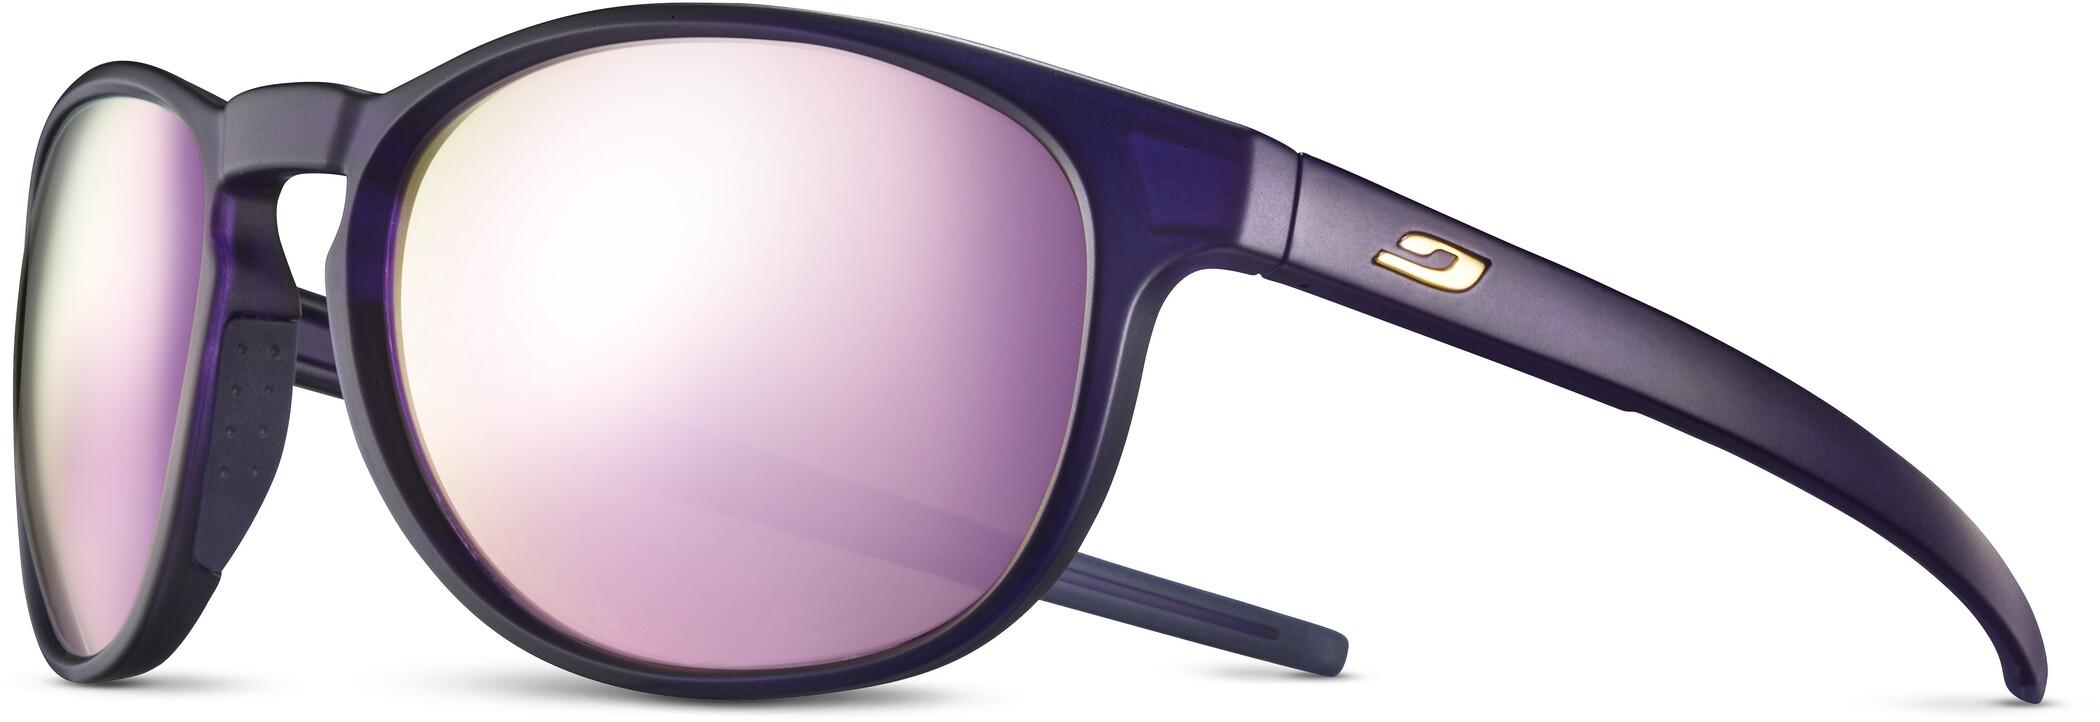 Julbo Elevate Spectron 3CF Solbriller, plume/multilayer rosa (2020) | Glasses